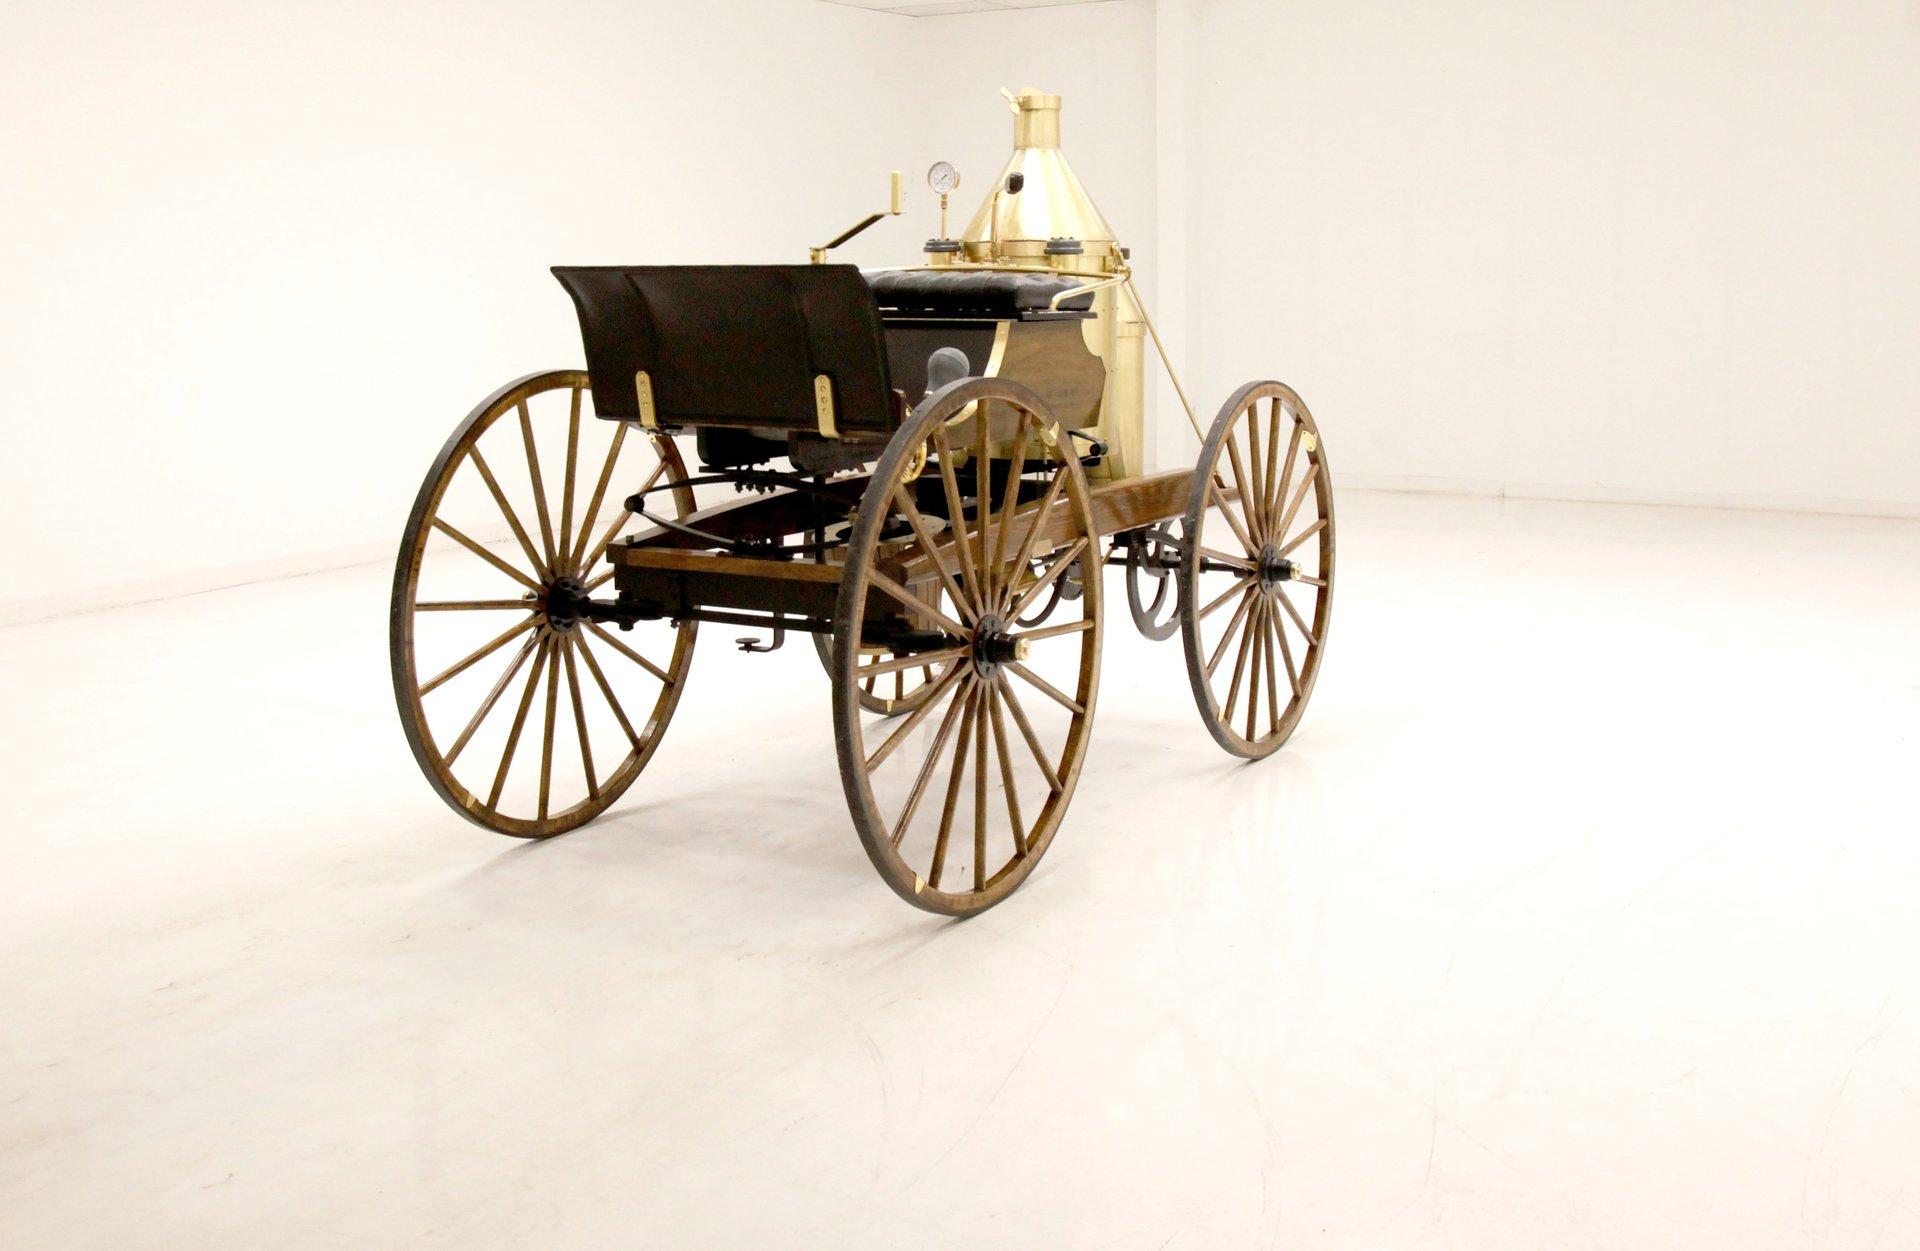 1890 Roper Steam Carriage